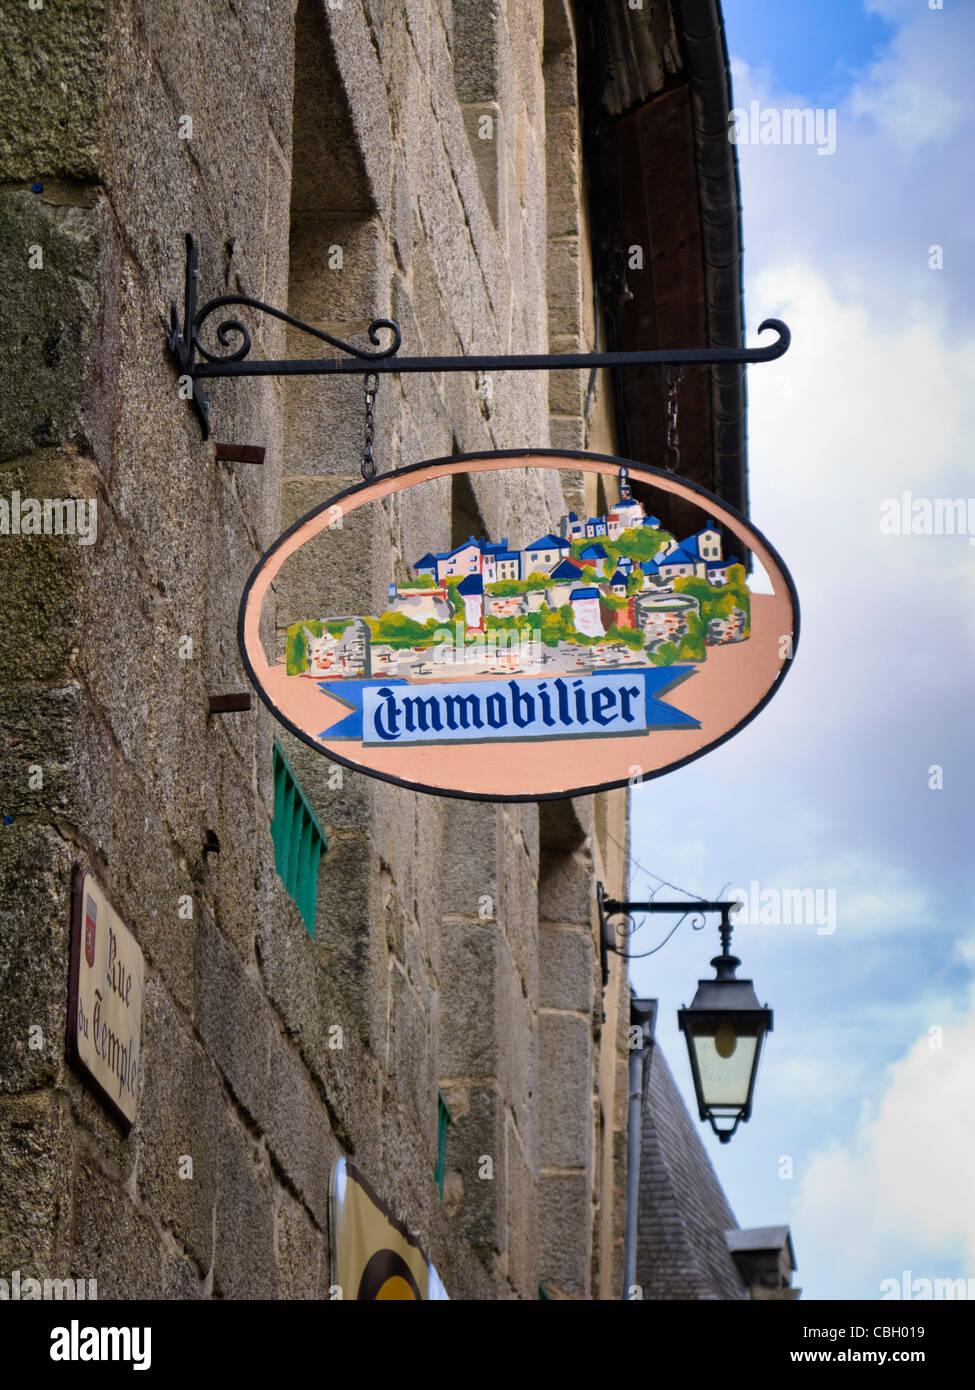 Immobilier - Real Estate Agent - shop sign, France - Stock Image